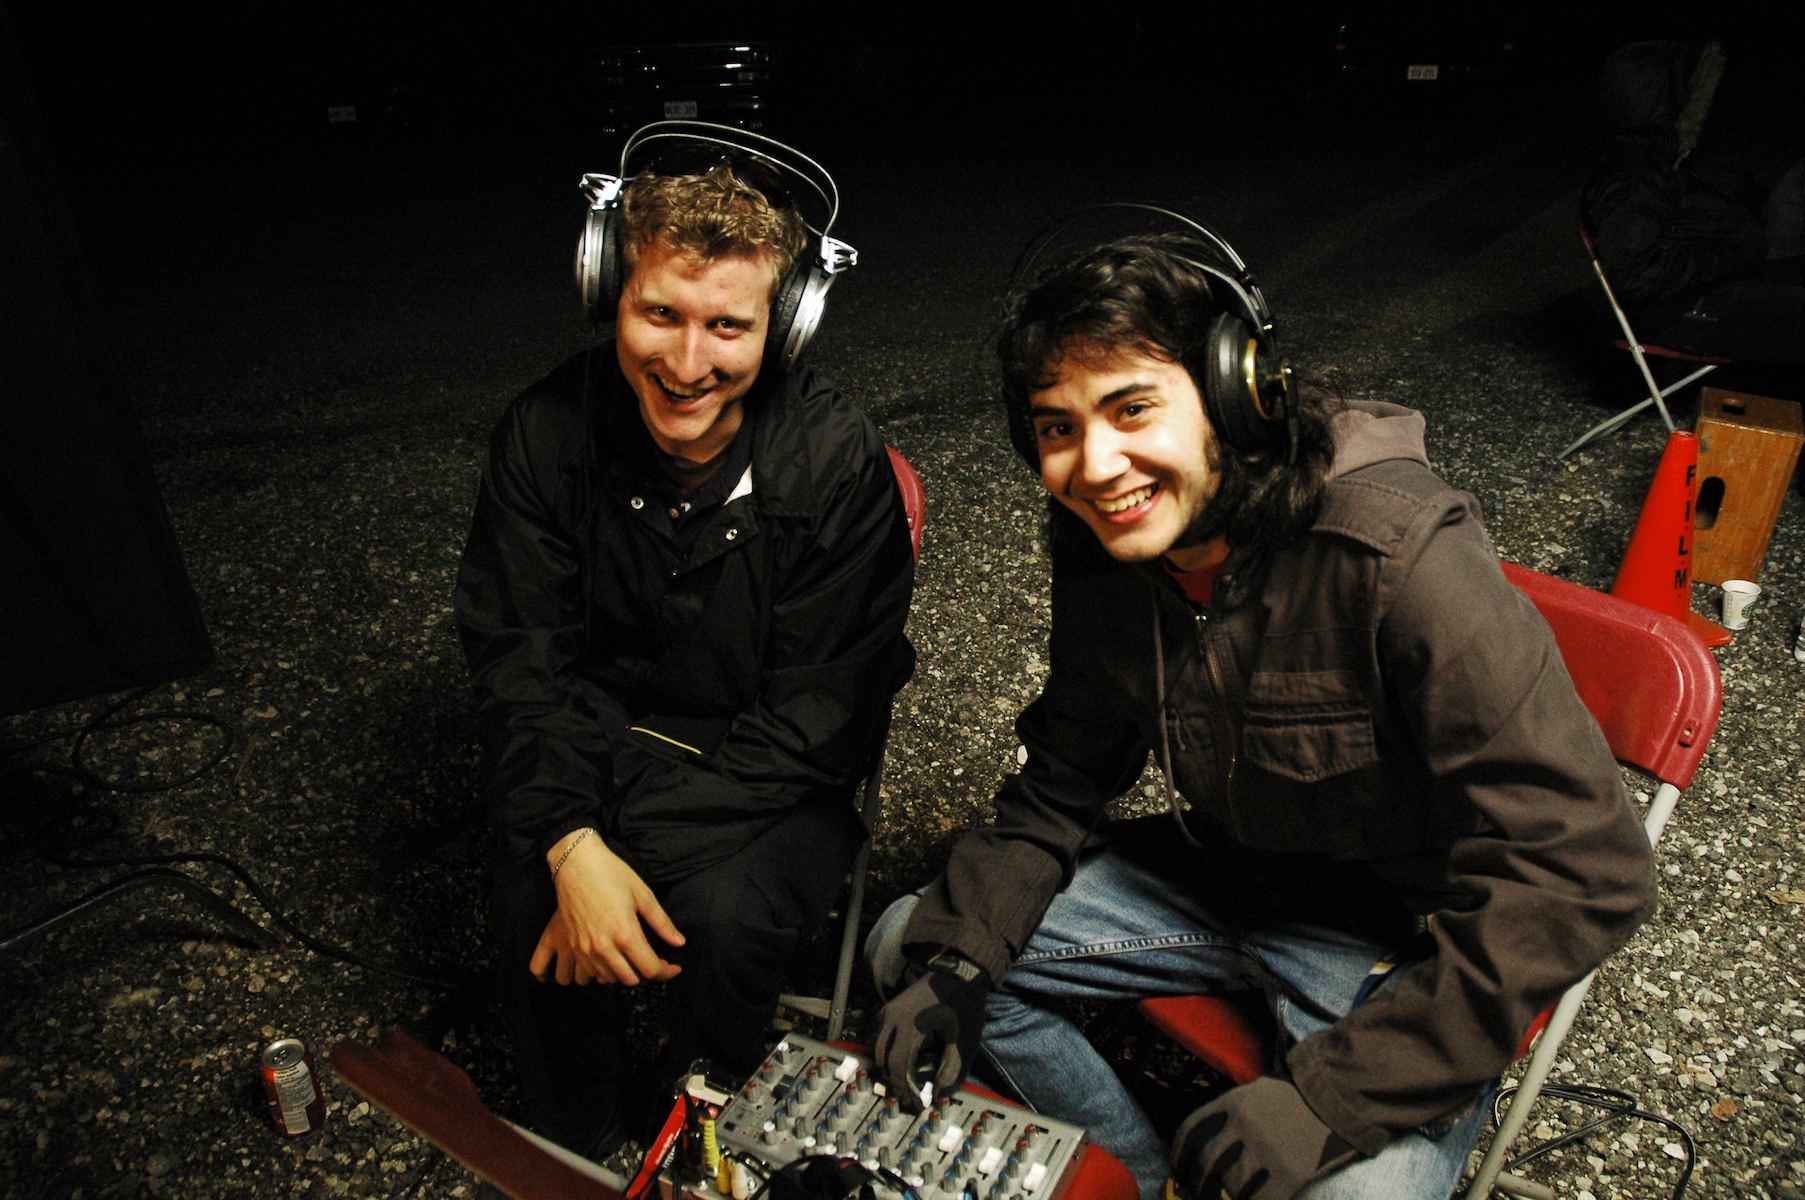 Sound Recordists, Corey Peck & Ross Citrullo